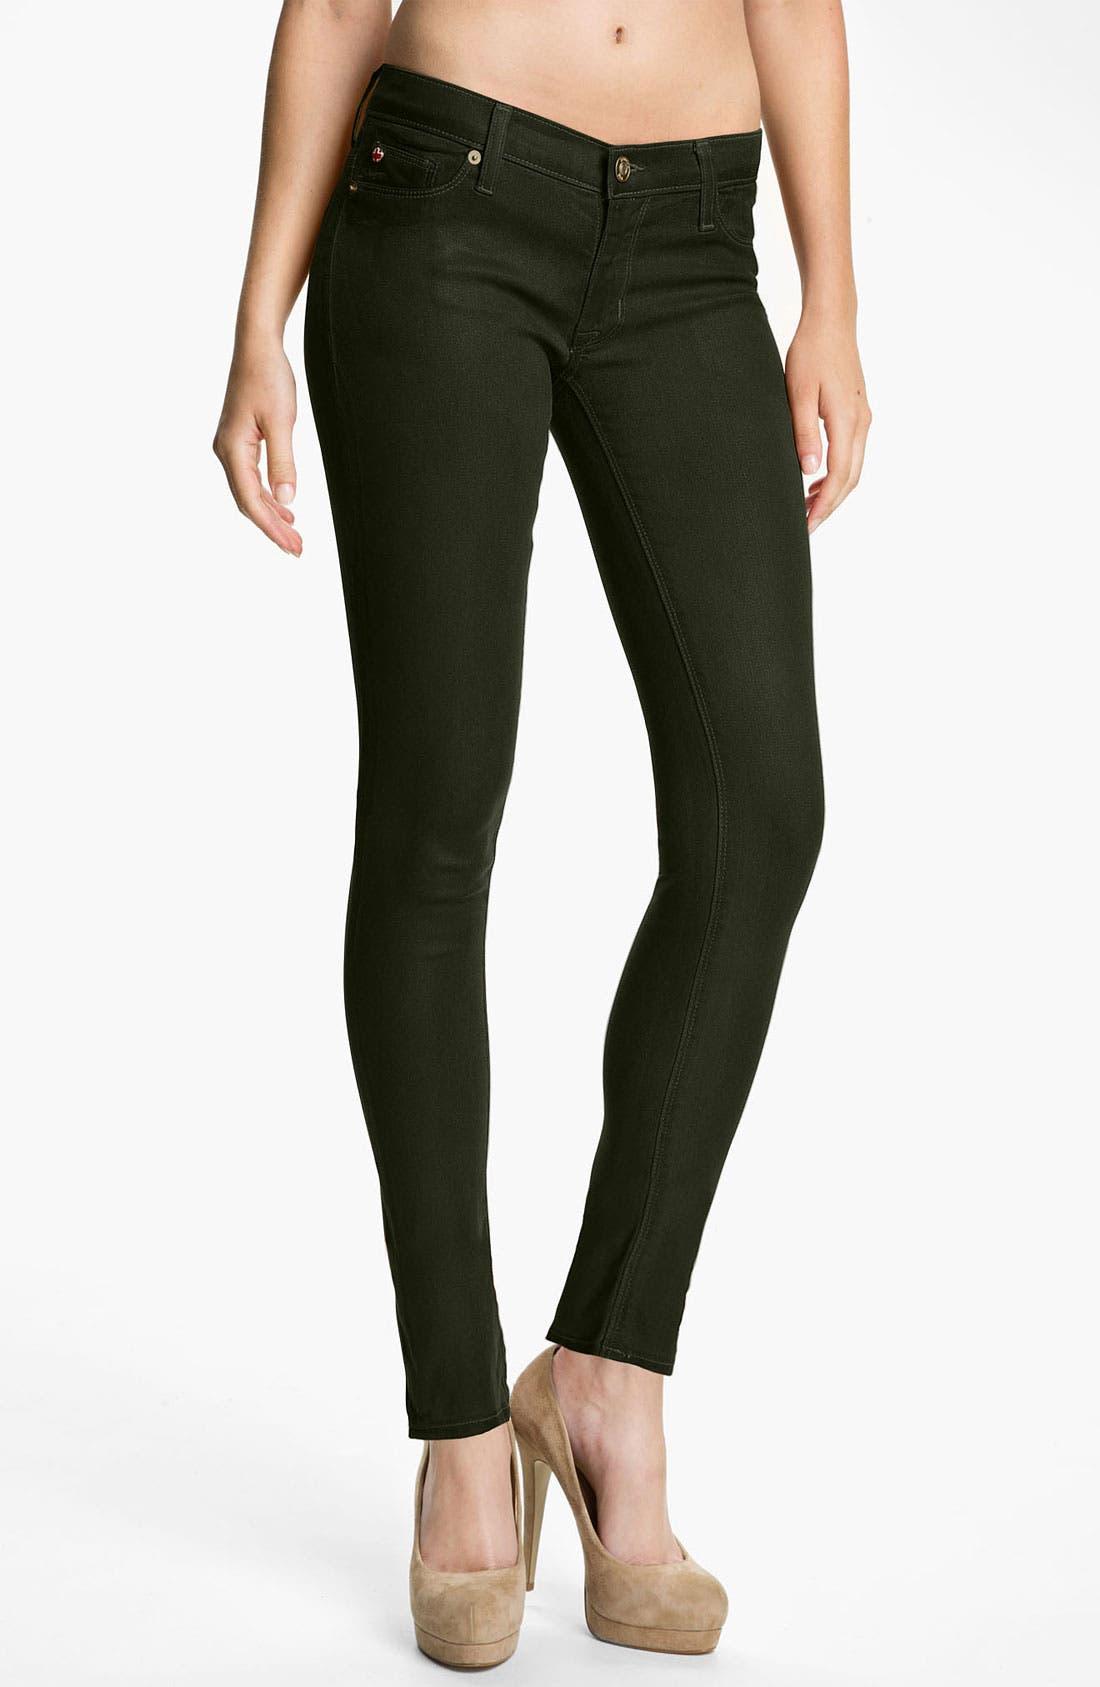 Main Image - Hudson Jeans 'Krista' Super Skinny Jeans (Fern Wax)